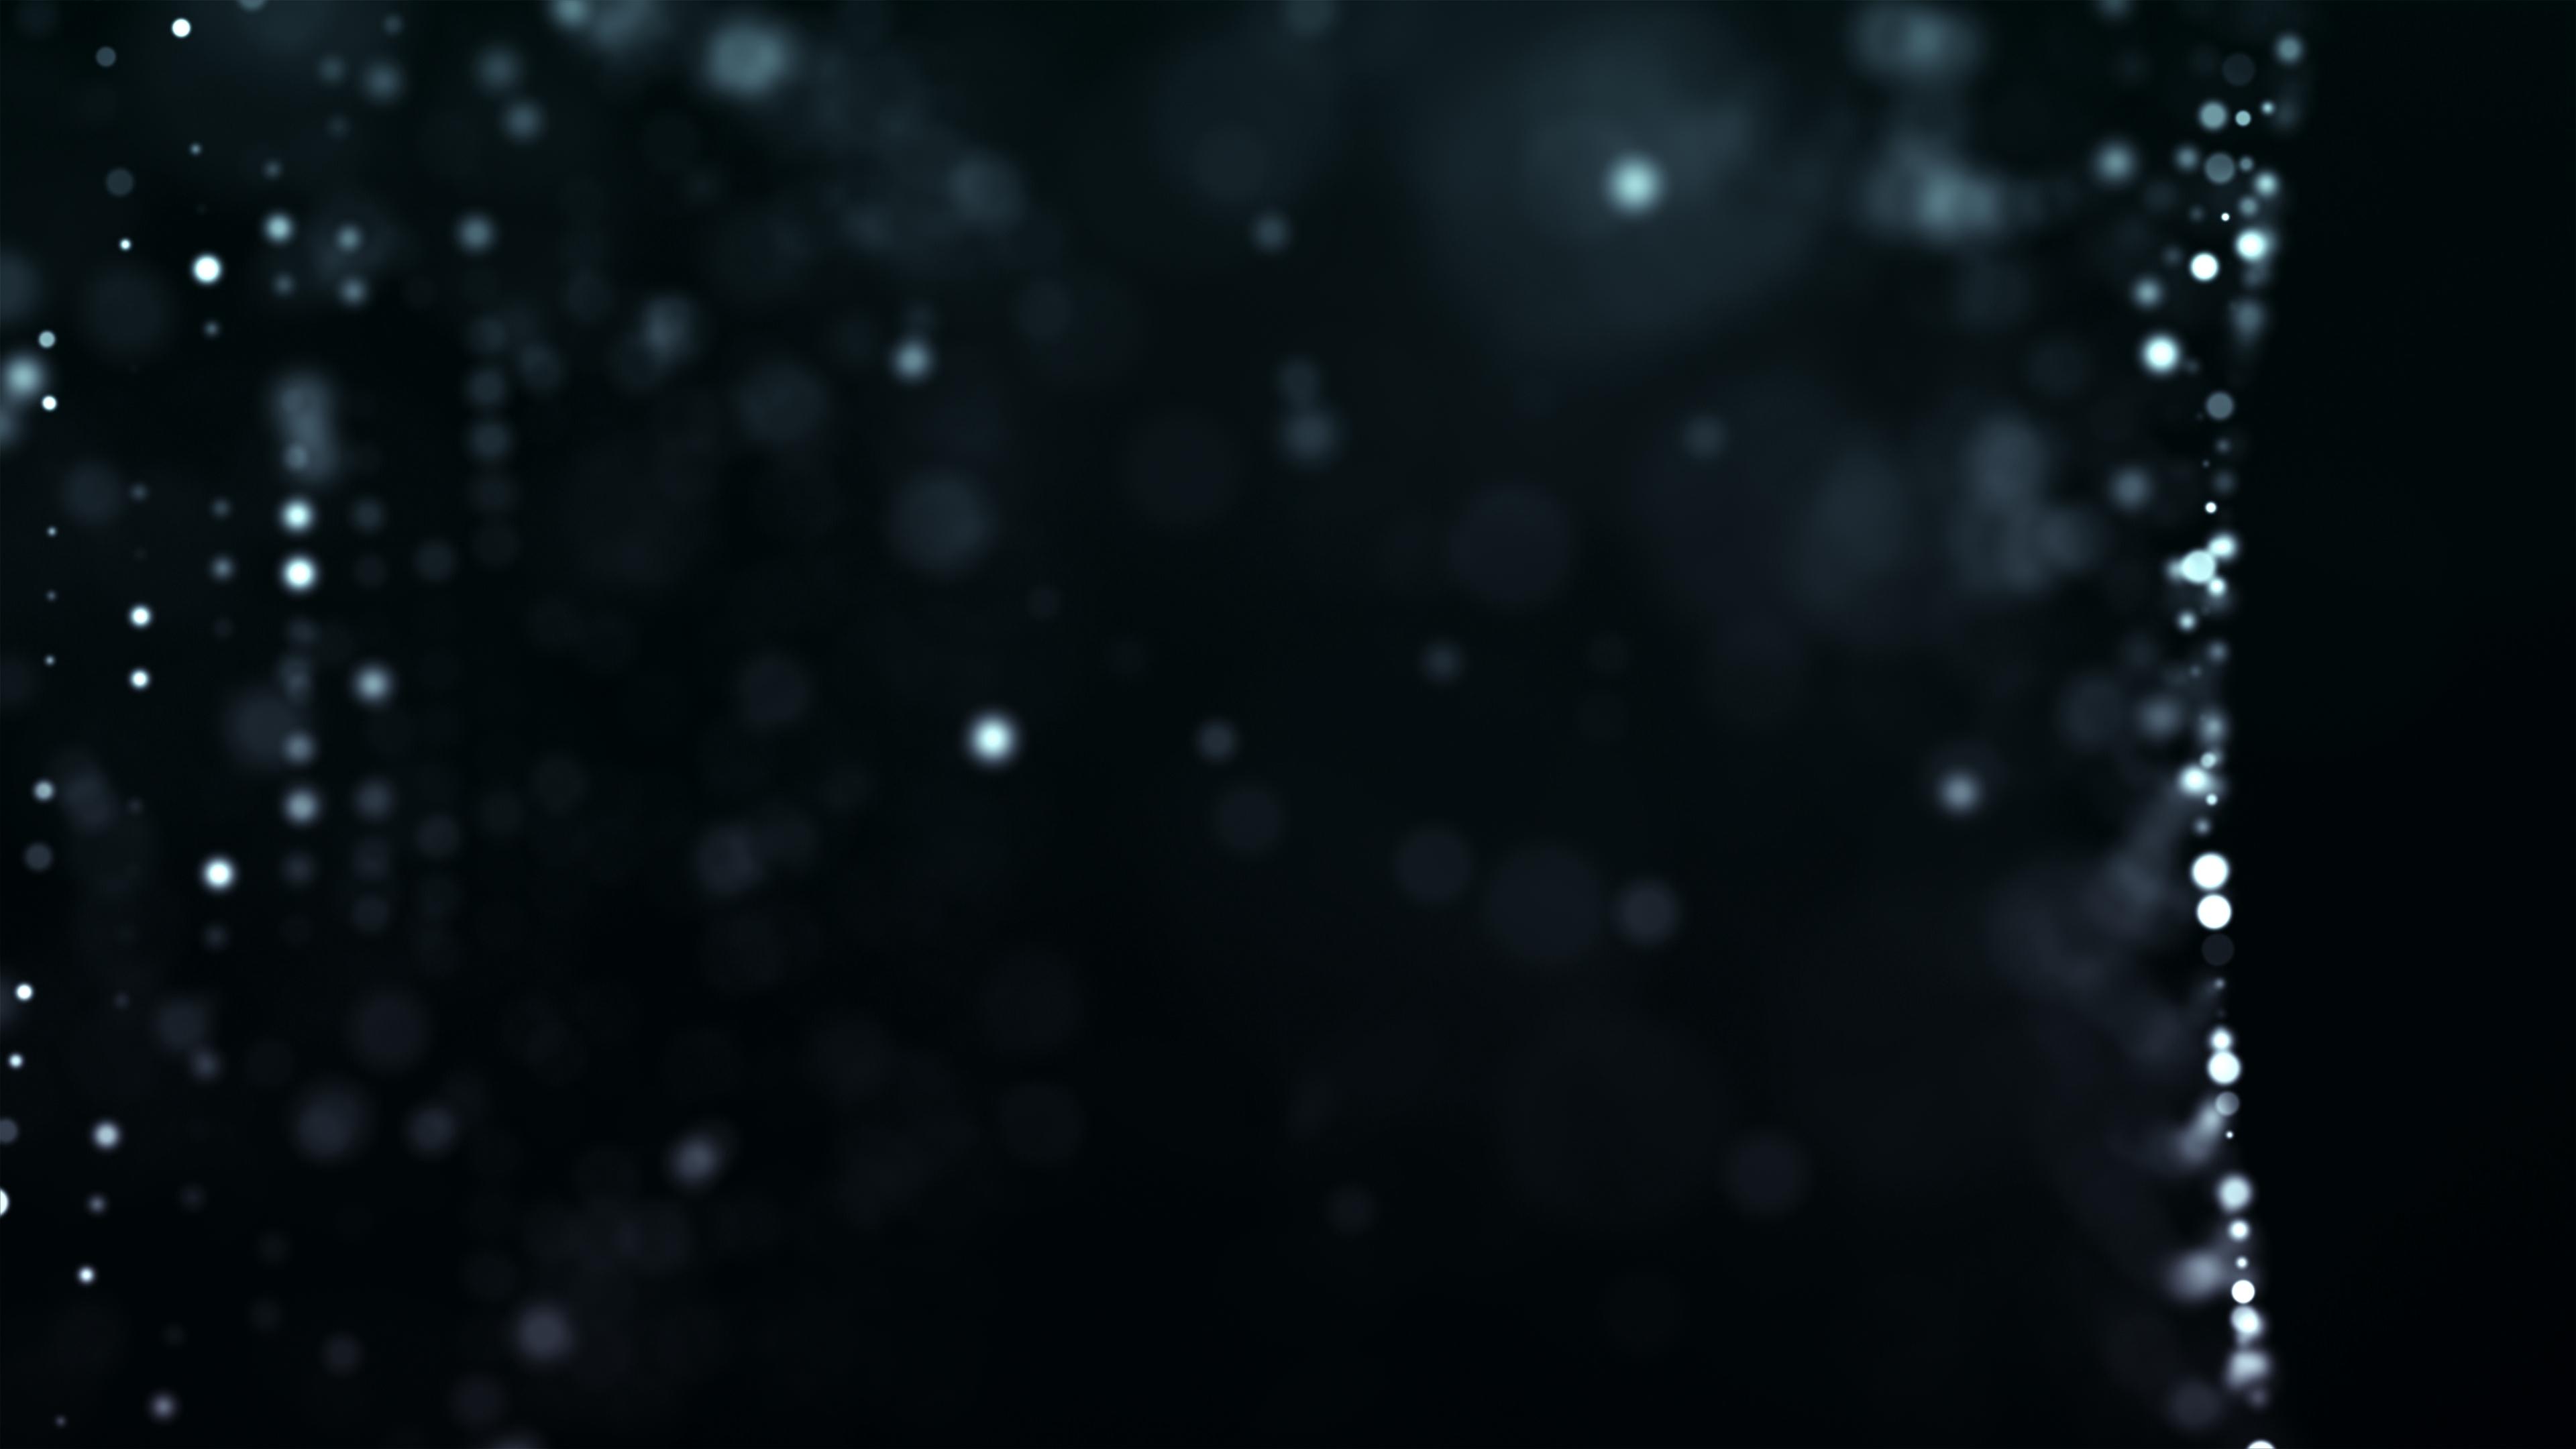 glares spots black background 4k 1540575342 - glares, spots, black background 4k - spots, glares, black background